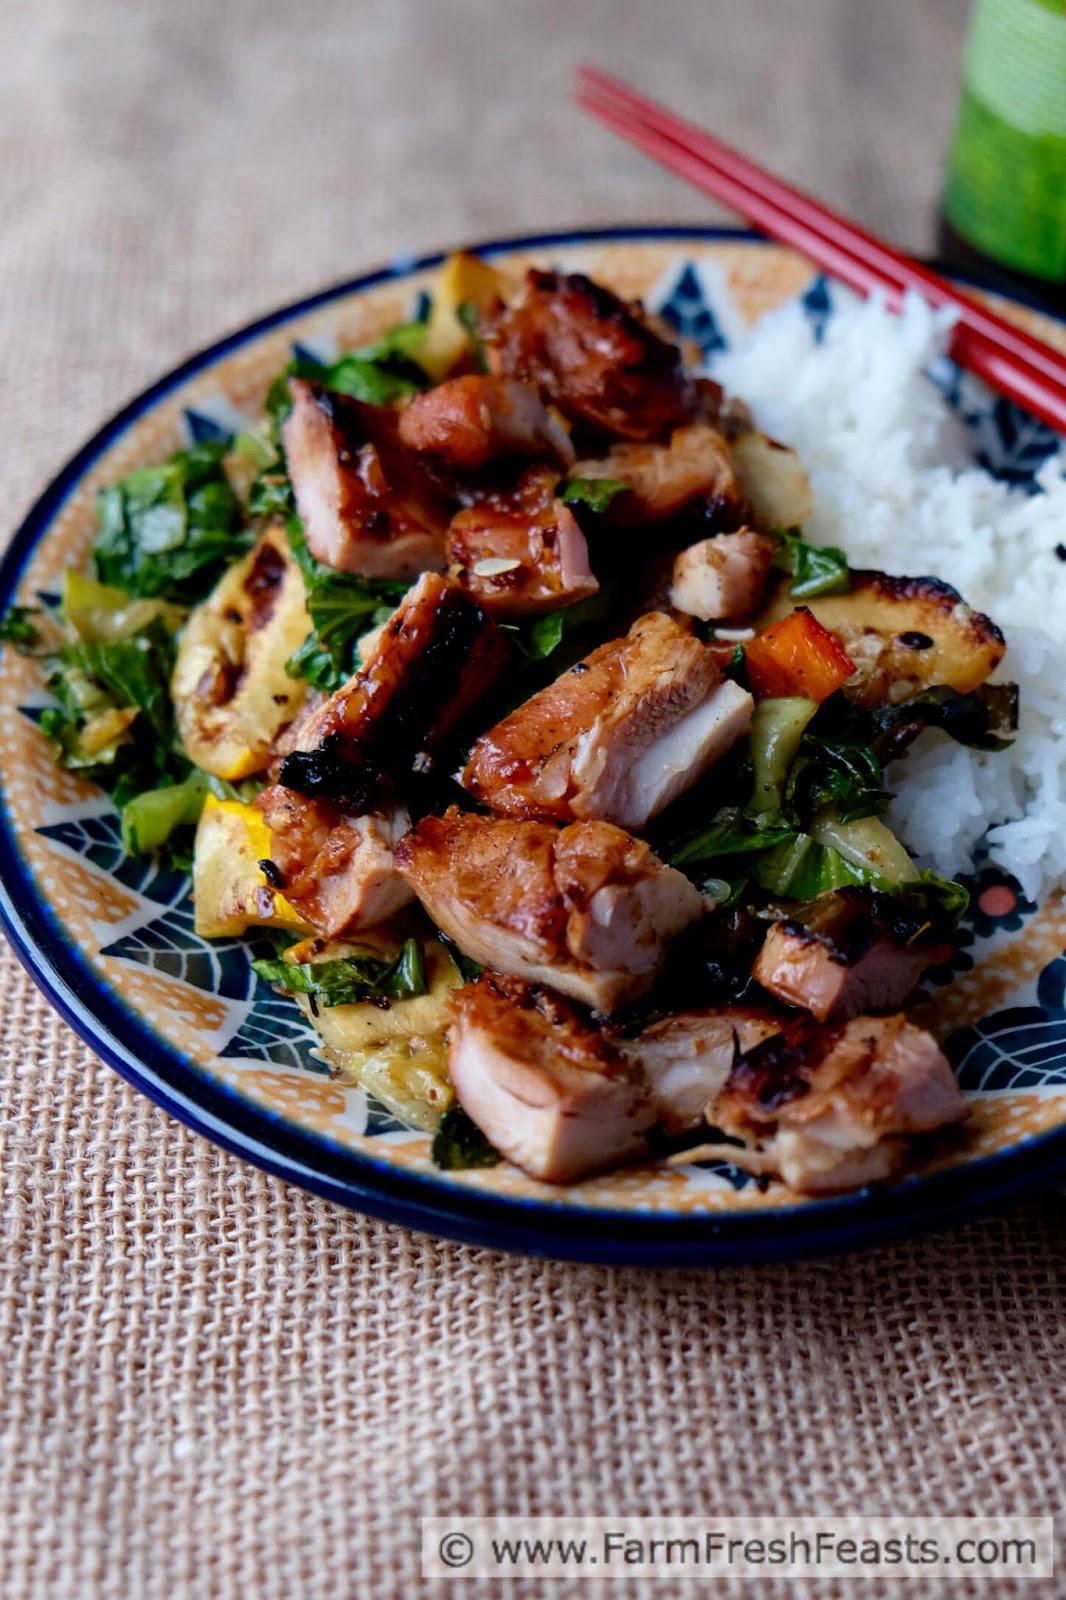 Korean Chicken Thighs  Farm Fresh Feasts Grilled Korean Chicken Thighs with